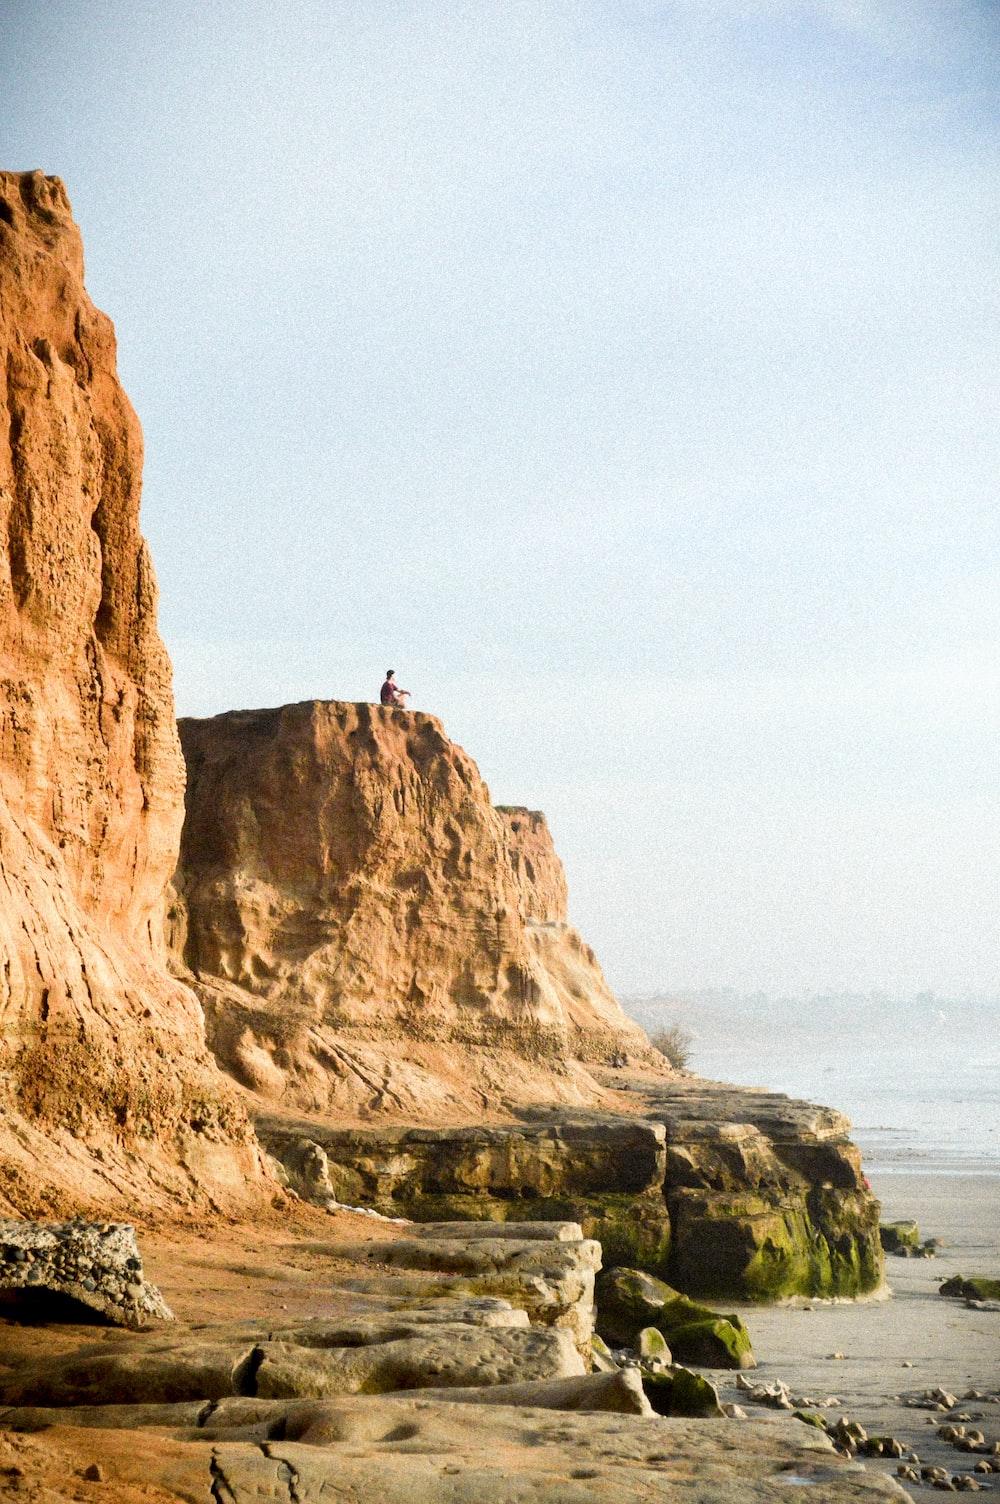 man on cliff near water